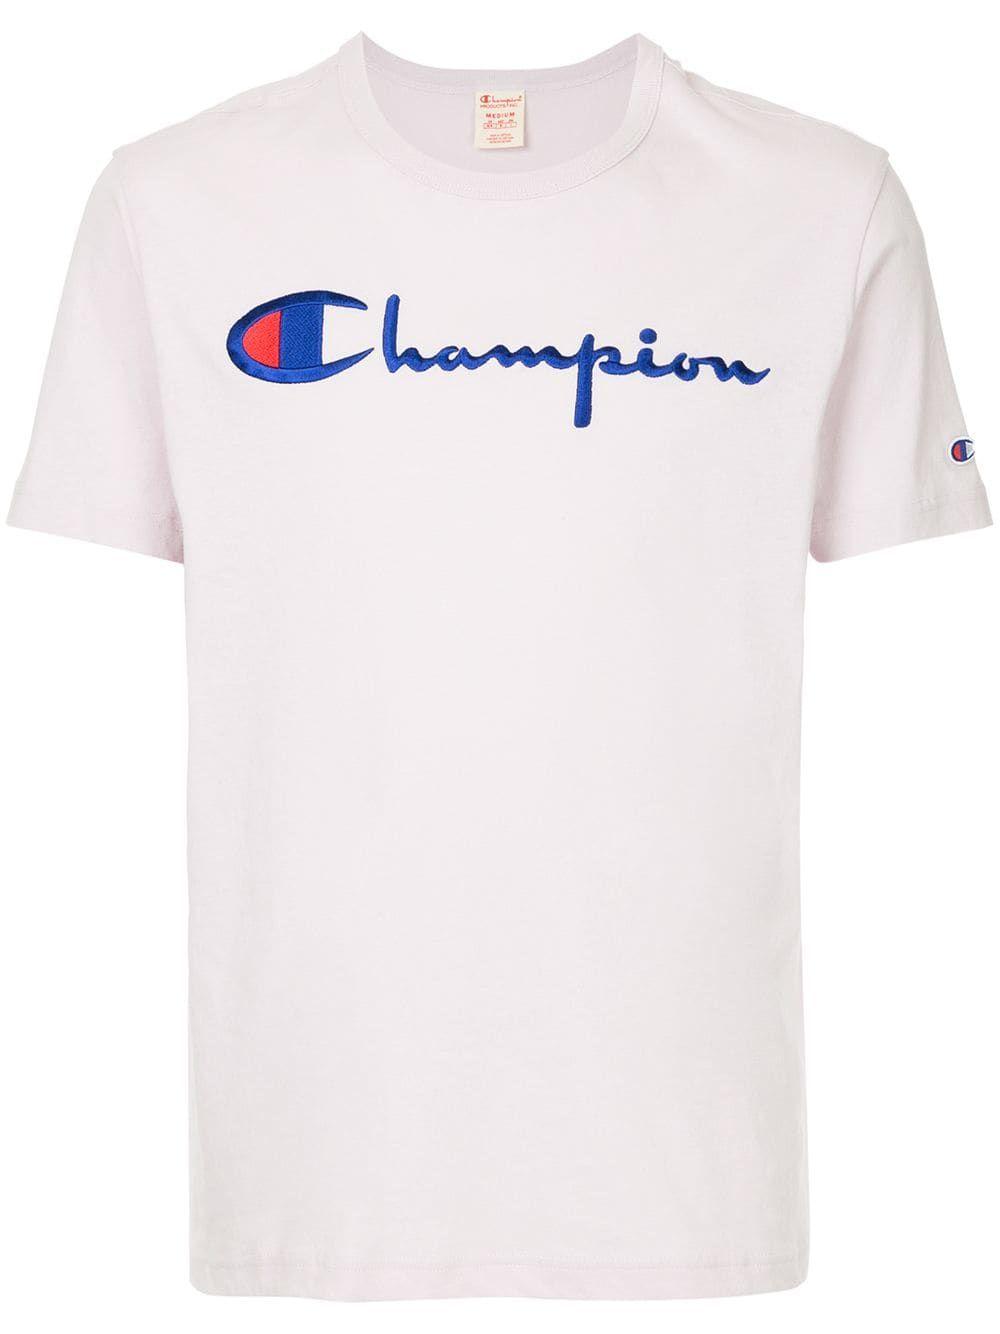 58783623 CHAMPION CHAMPION LOGO EMBROIDERED T-SHIRT - PINK & PURPLE. #champion #cloth